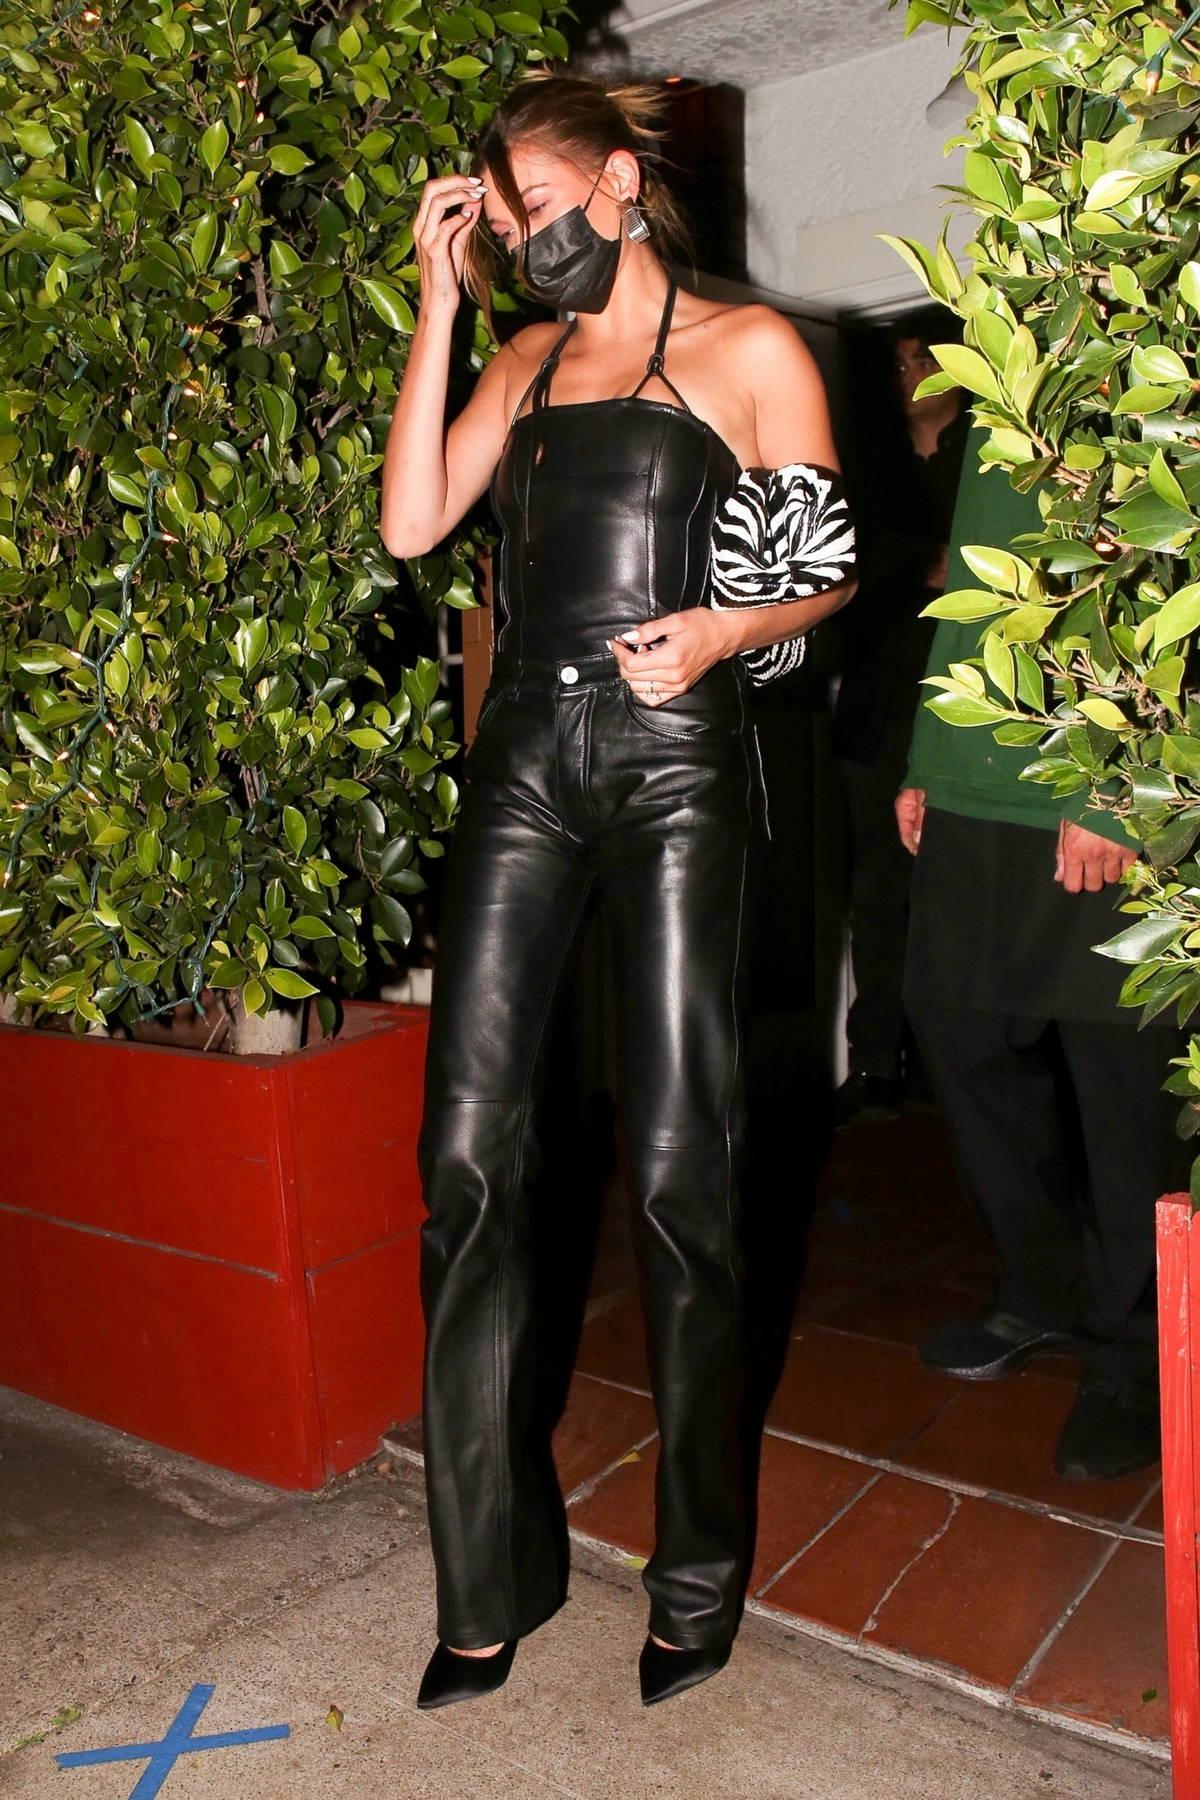 Hailey Bieber rocks an all-black leather outfit while grabbing dinner at Giorgio Baldi in Santa Monica, California